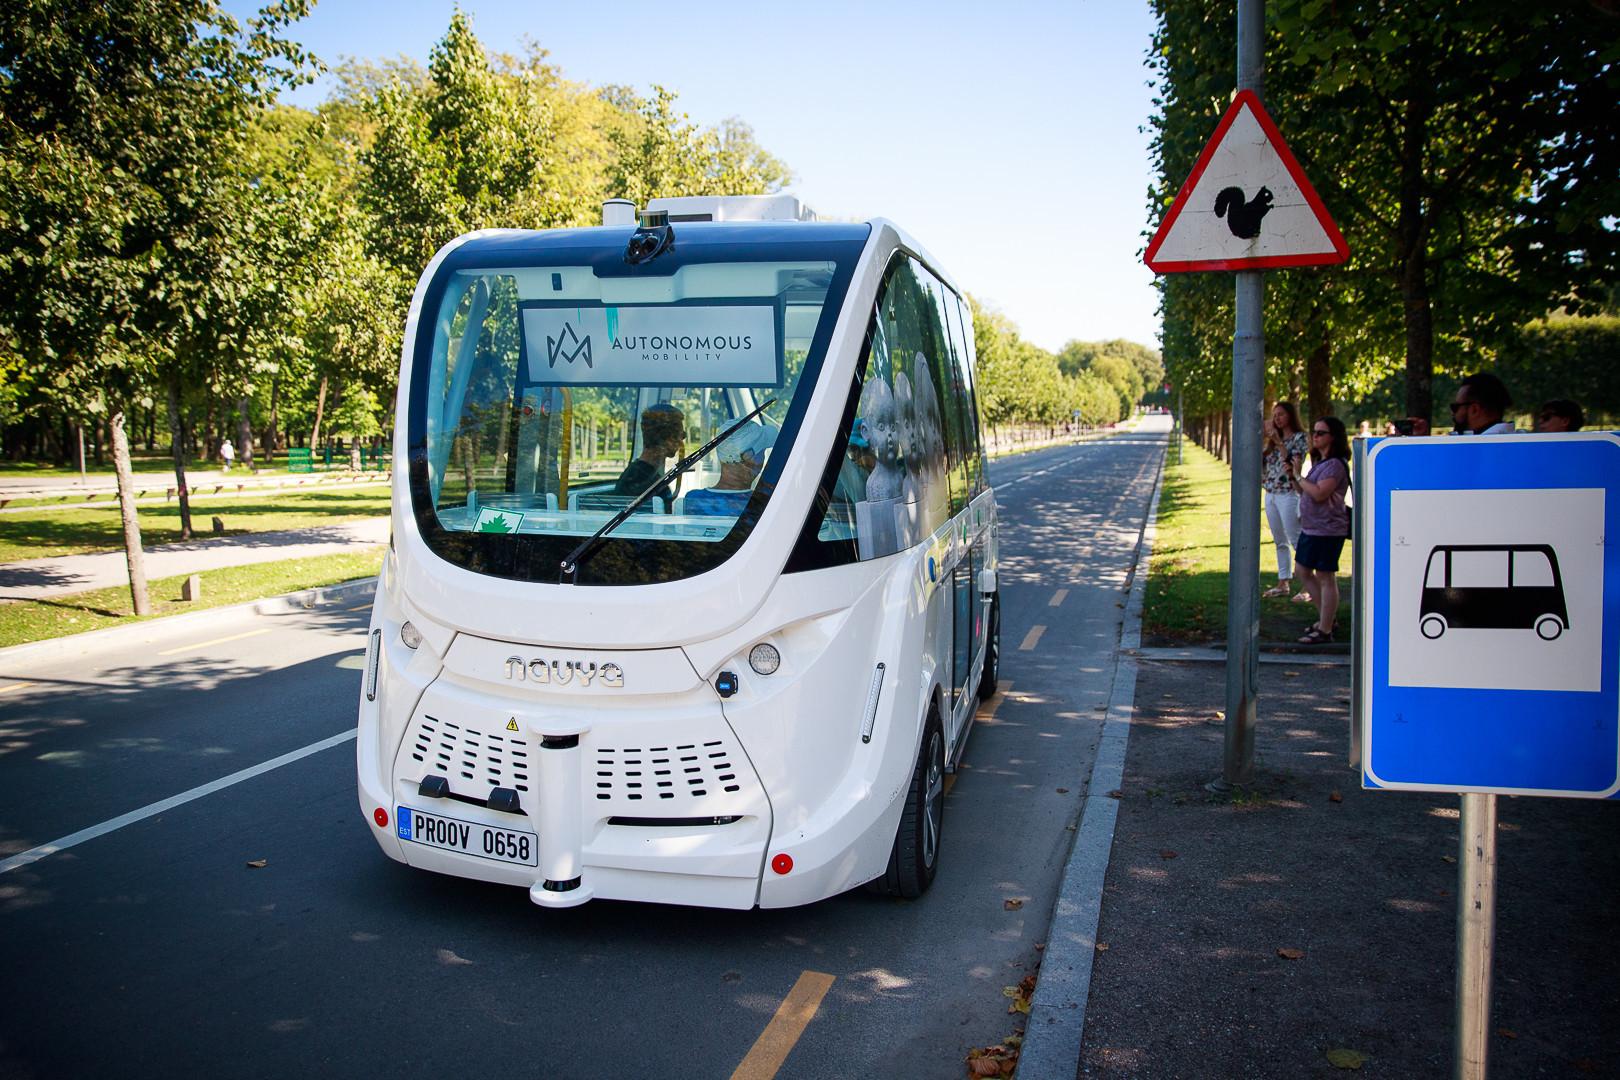 driverless public bus